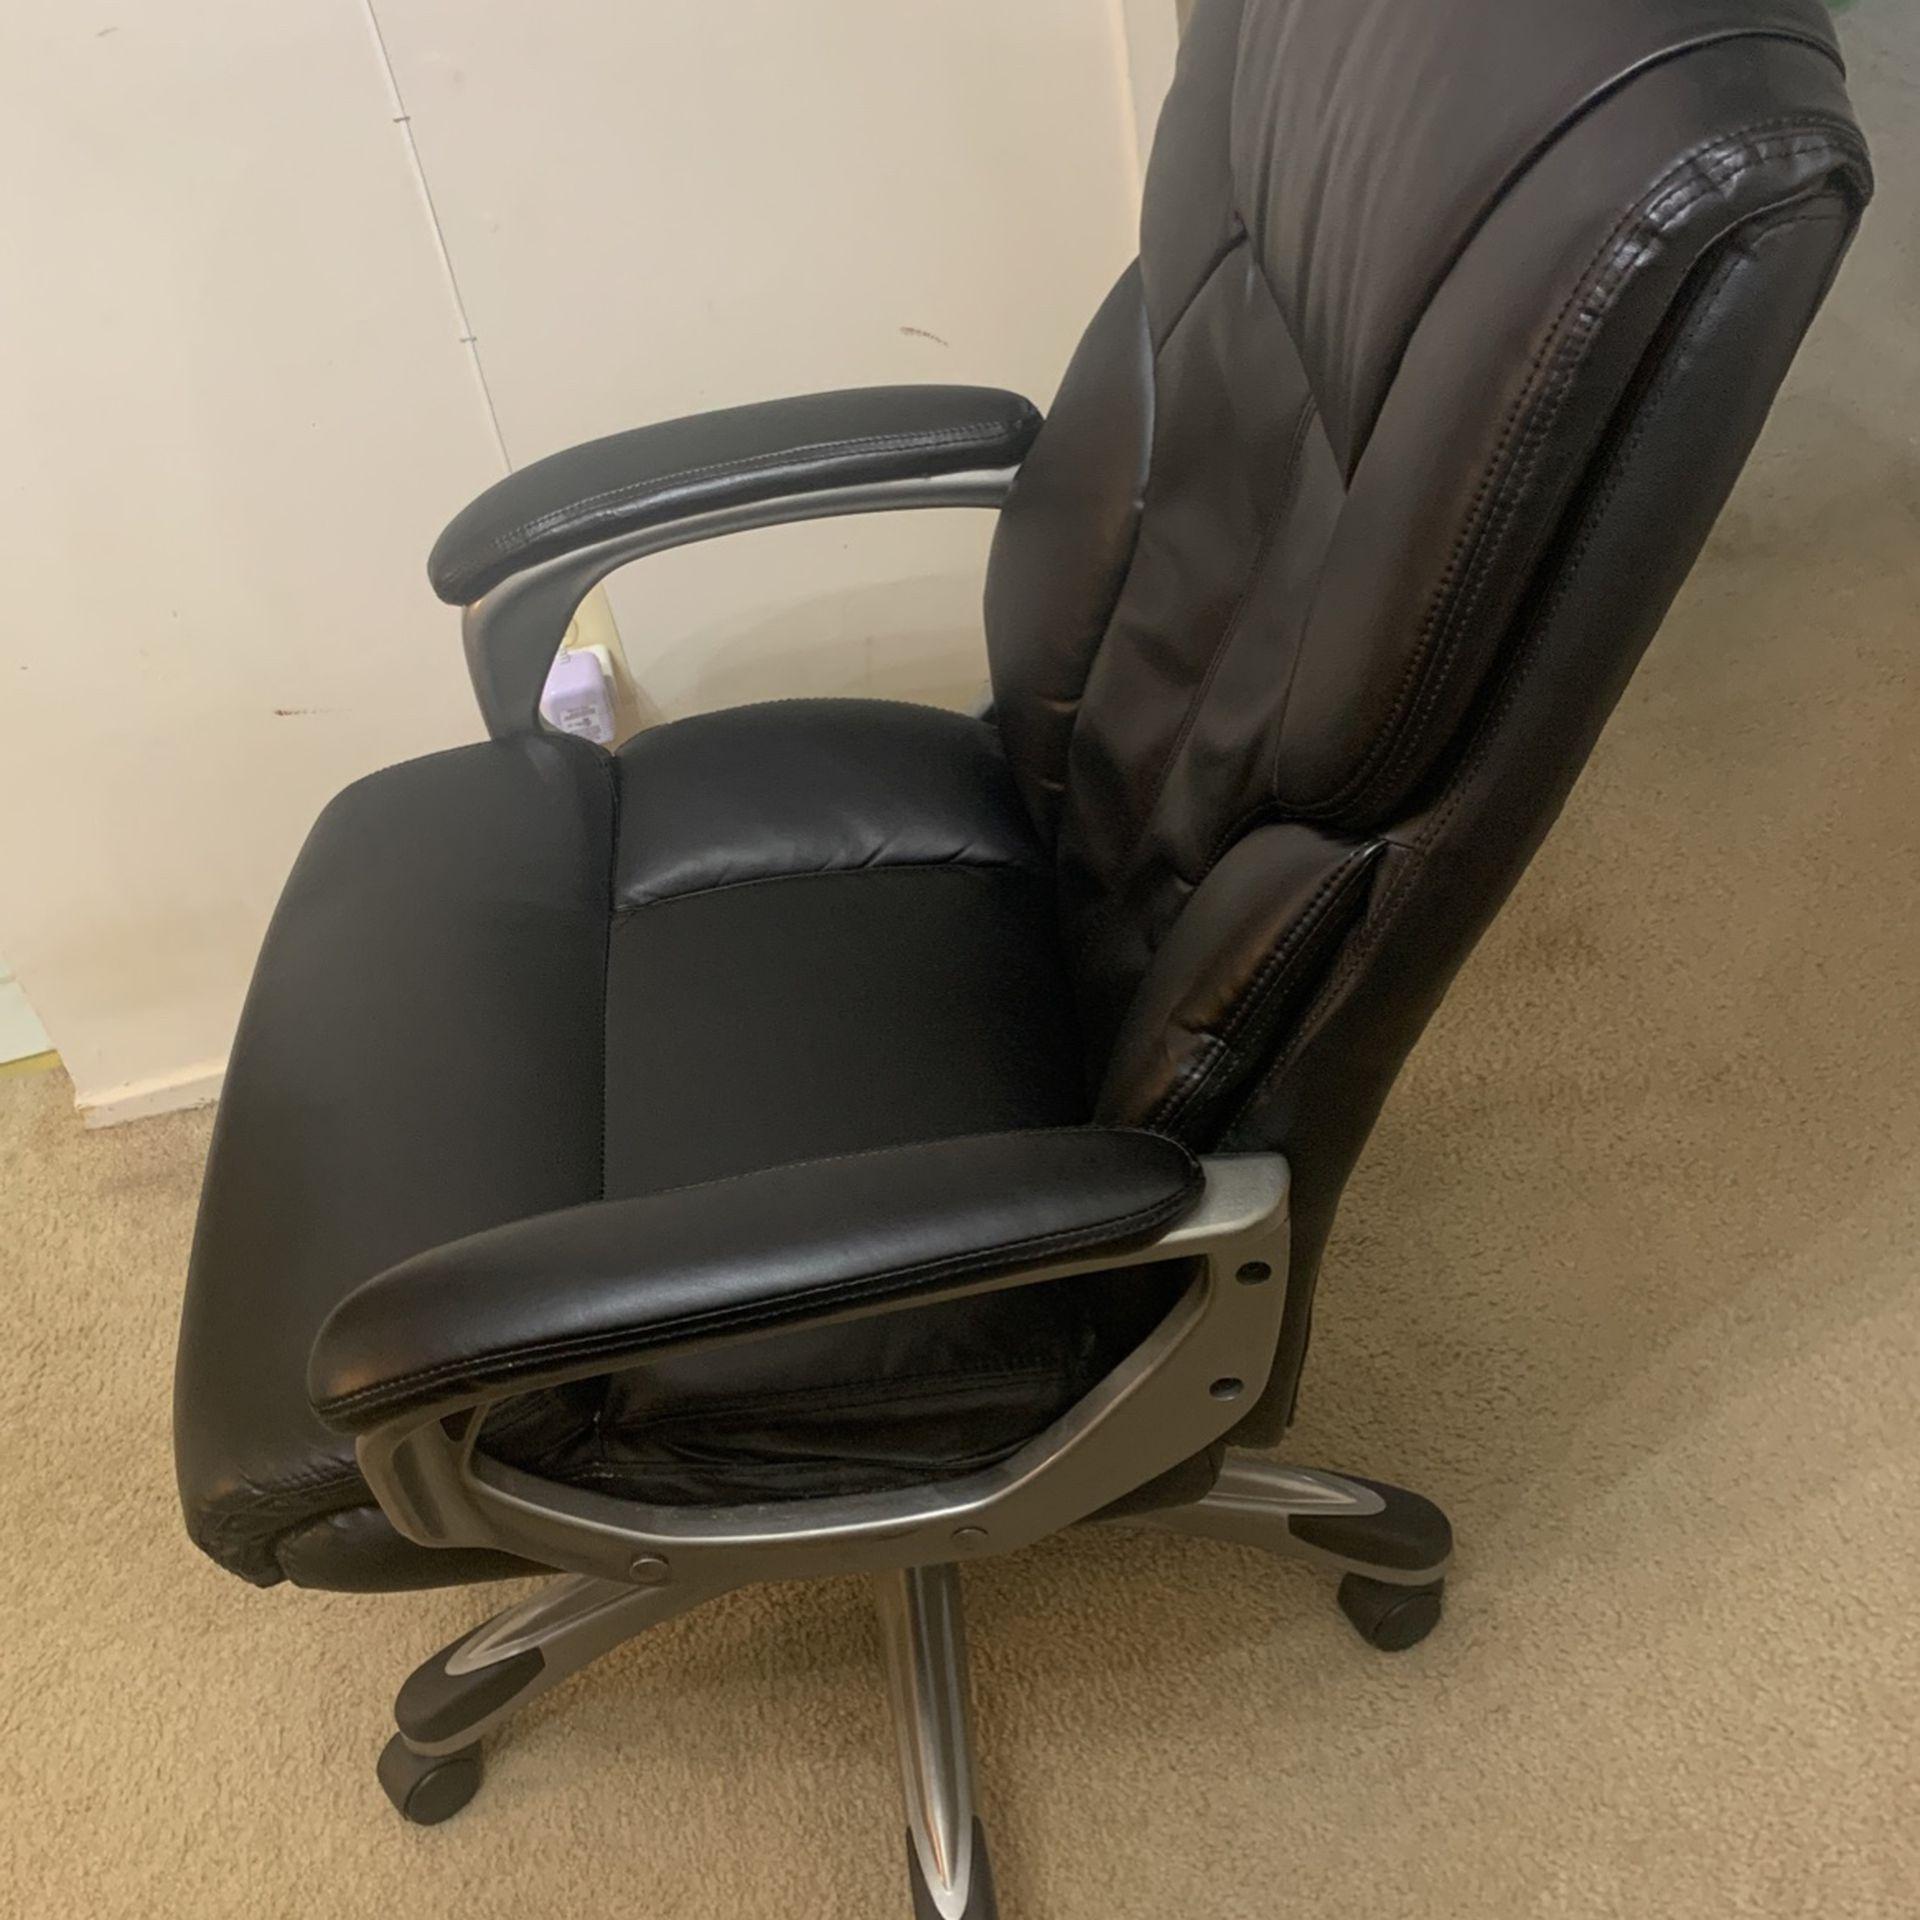 AmazonBasics High-back Executive Swivel Chair